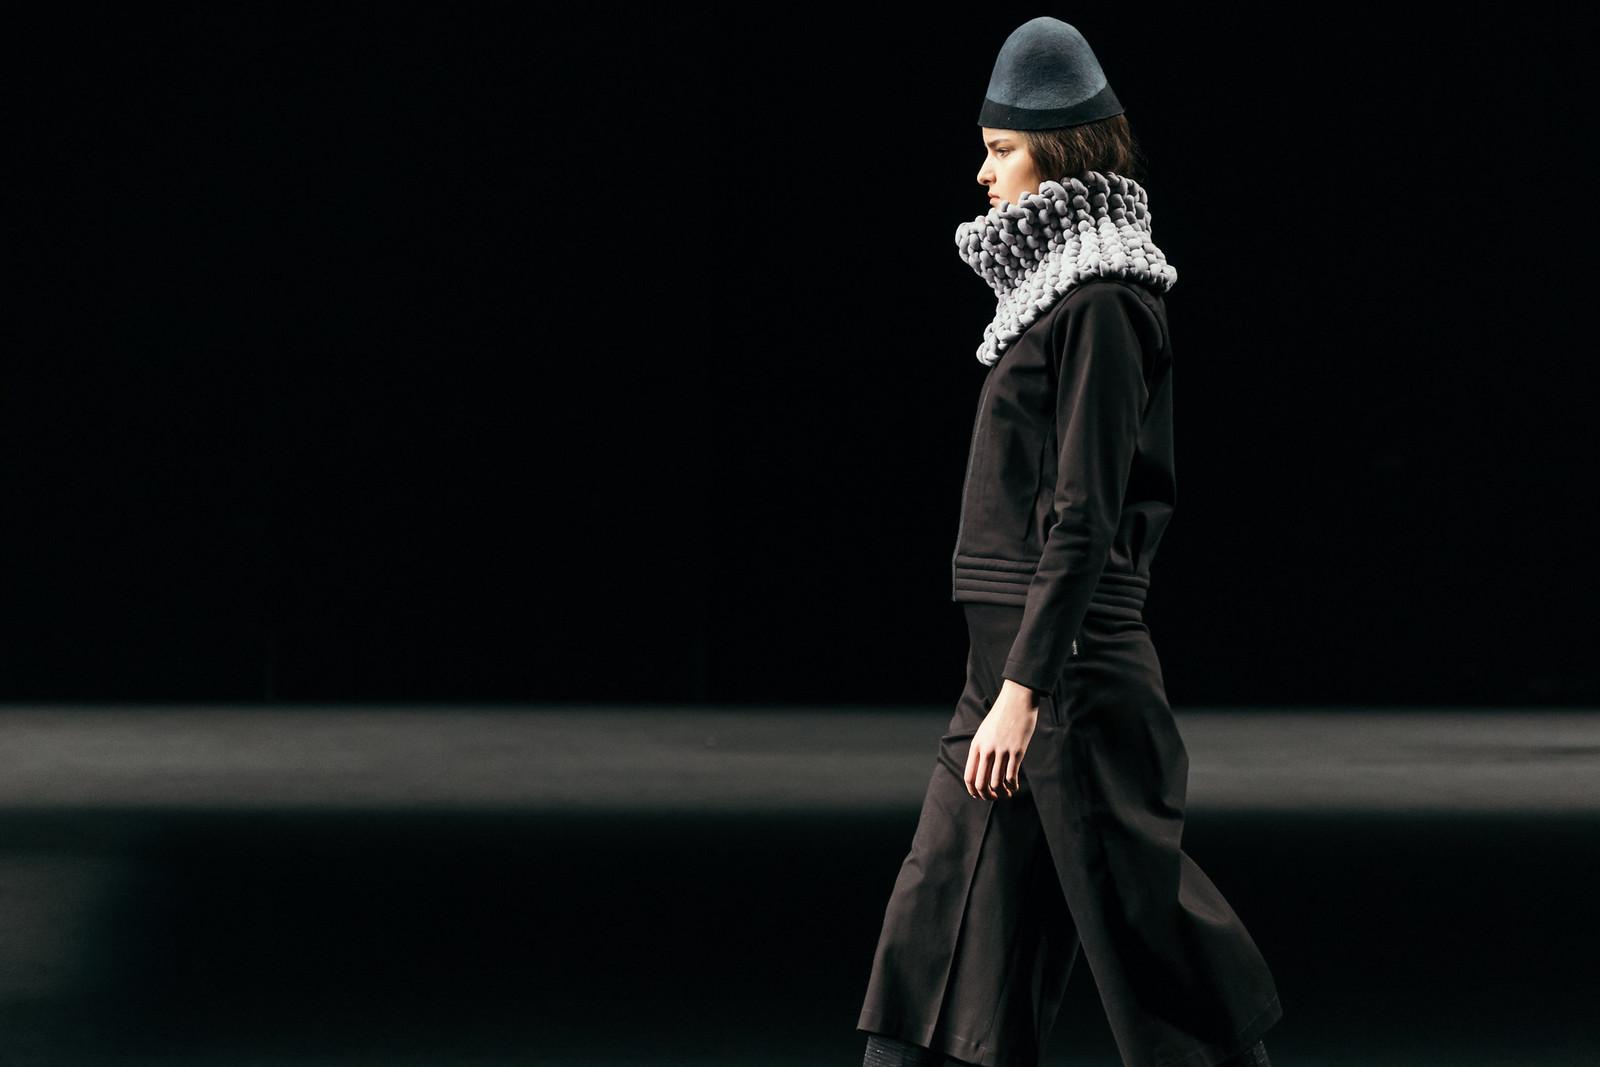 Jessie Chanes - Seams for a desire - 080 Bacelona Fashion #080bcnfasion -22